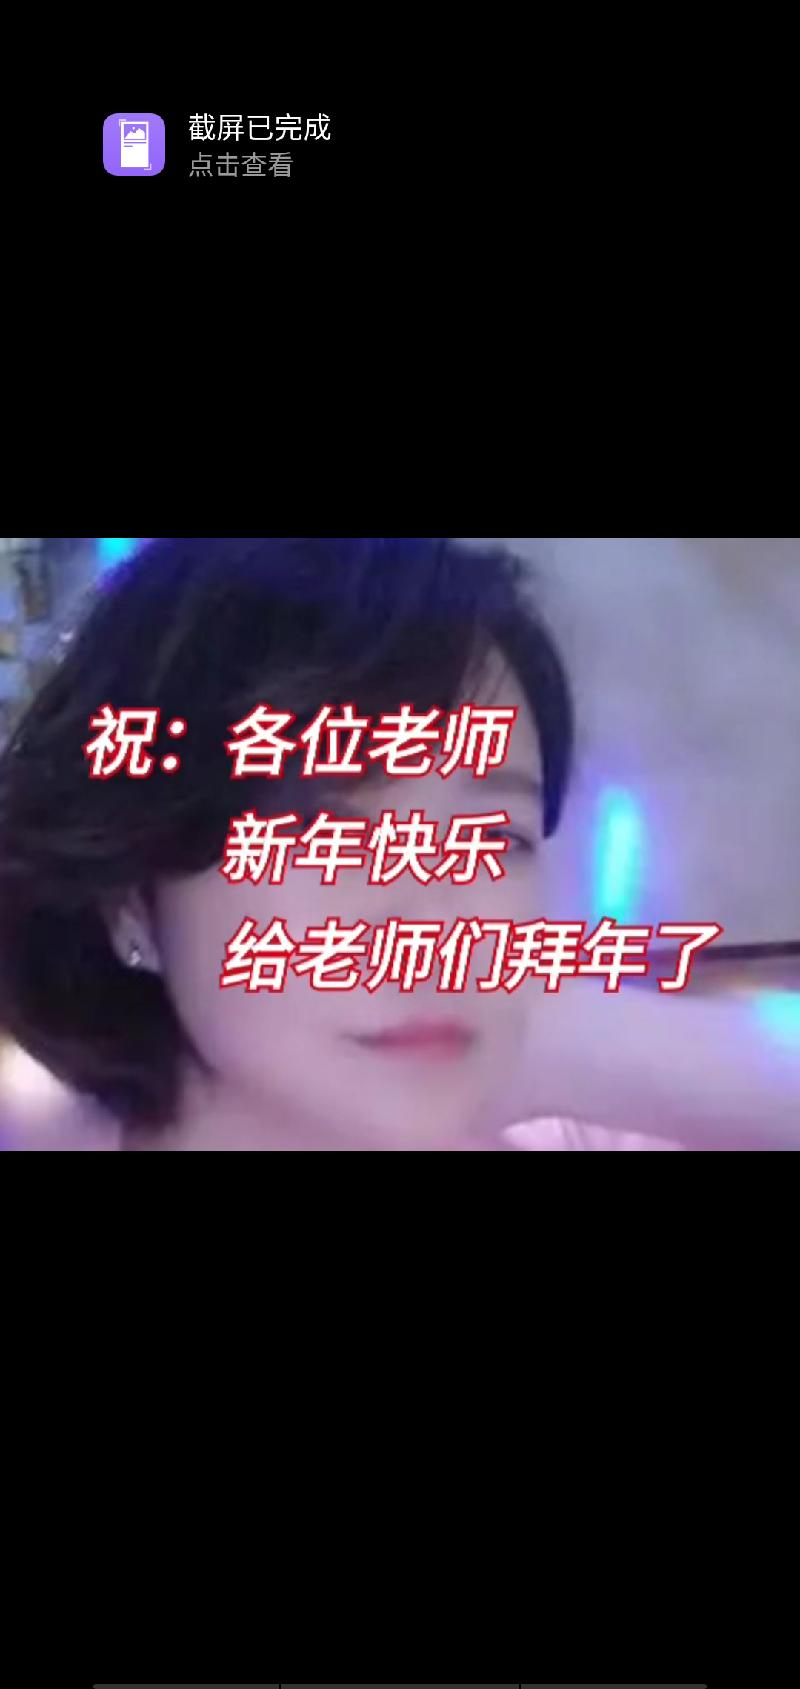 Screenshot_2020-01-15-11-43-51-51